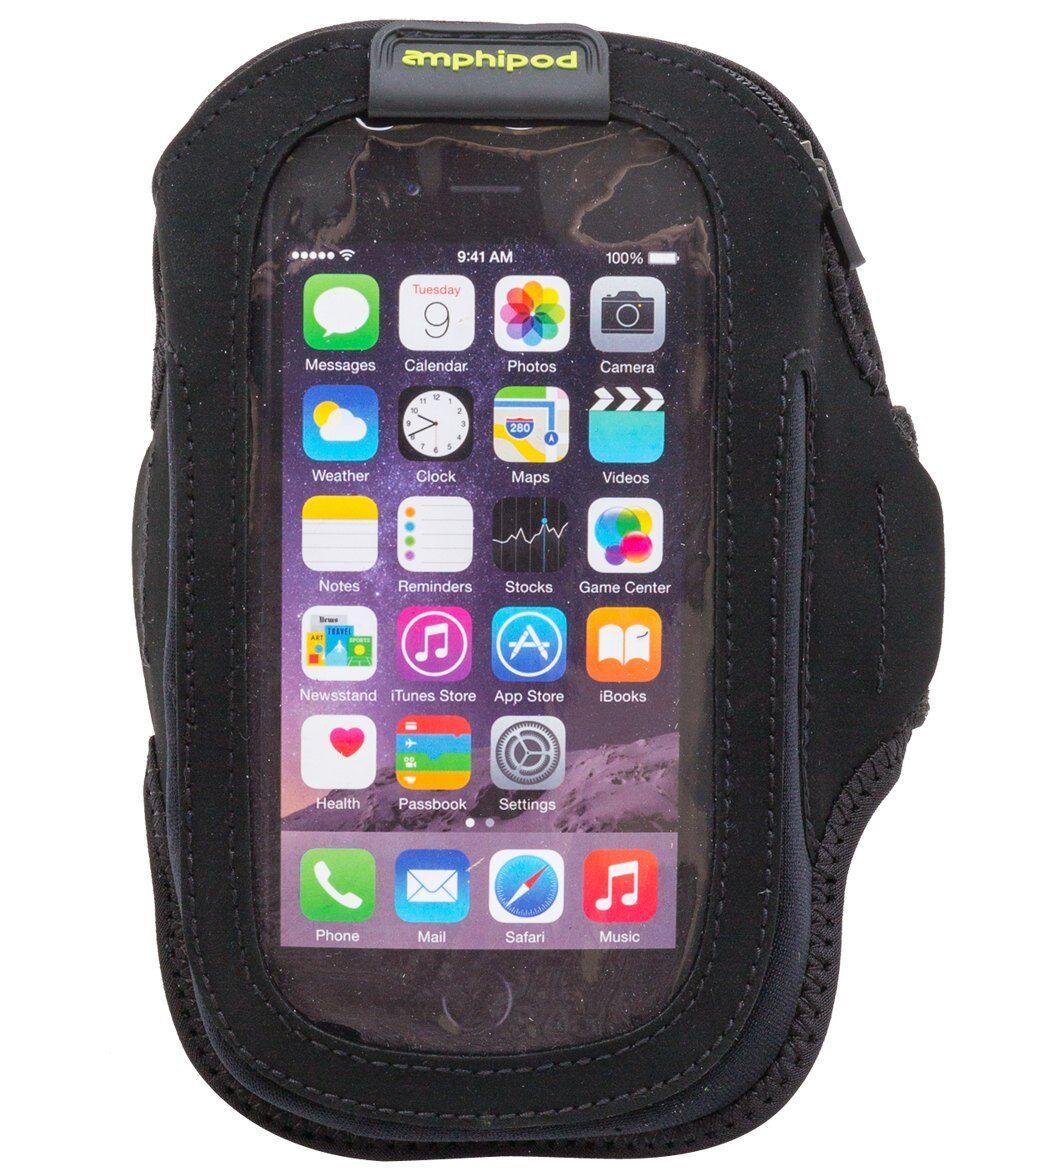 Amphipod Armpod Smartview Sumo Phone Armband - Black - Swimoutlet.com